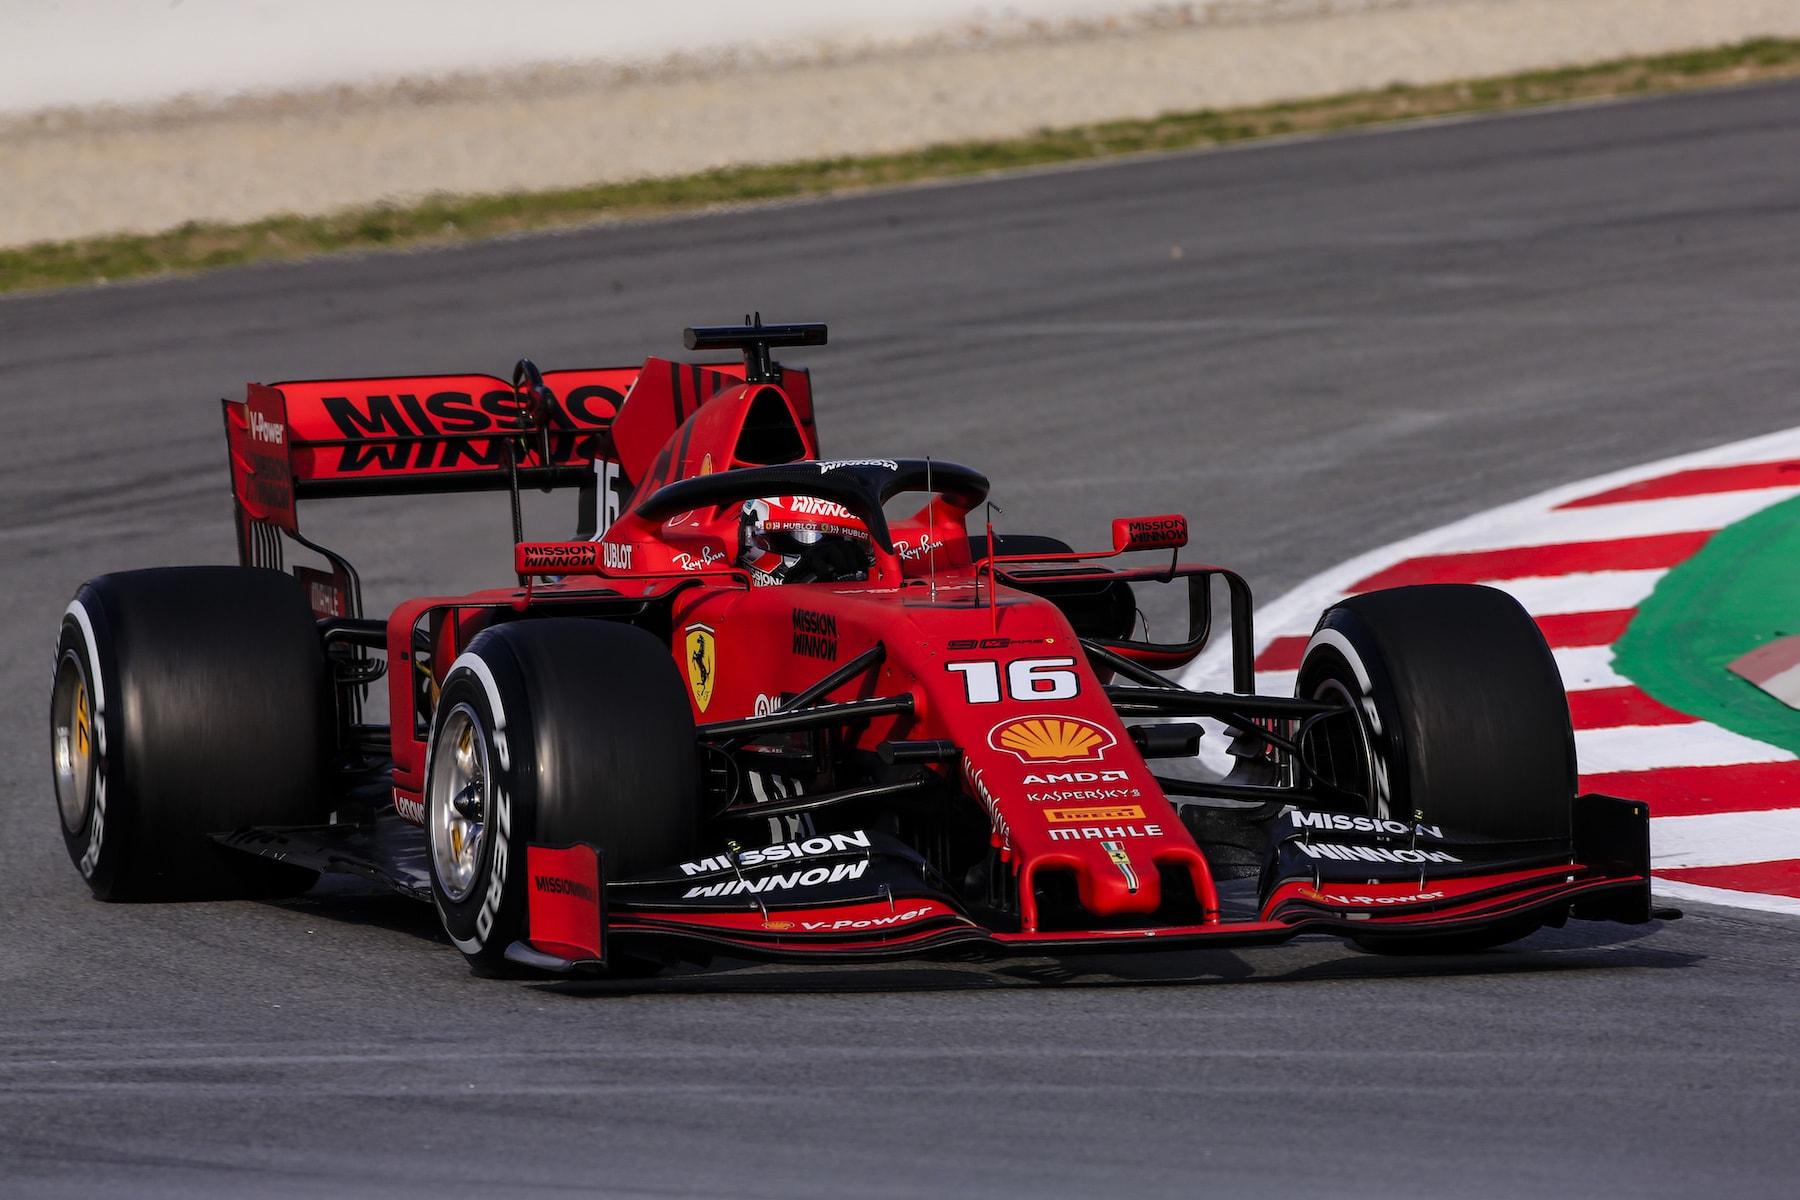 2019 Charles Leclerc   Ferrari SF90   2019 Barcelona T1 D2 8 copy.jpg